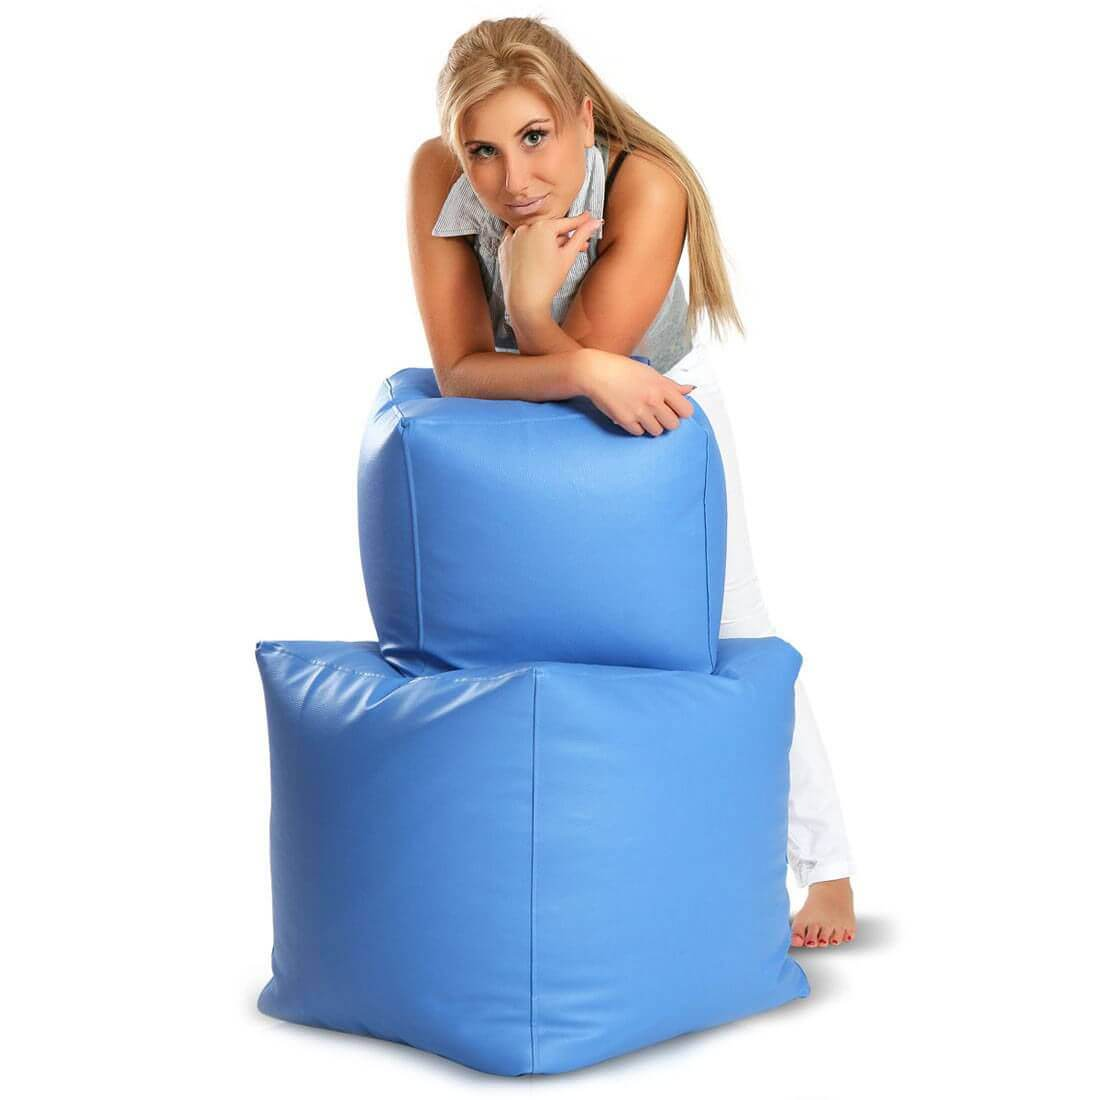 Cubes 37x37 cm modra